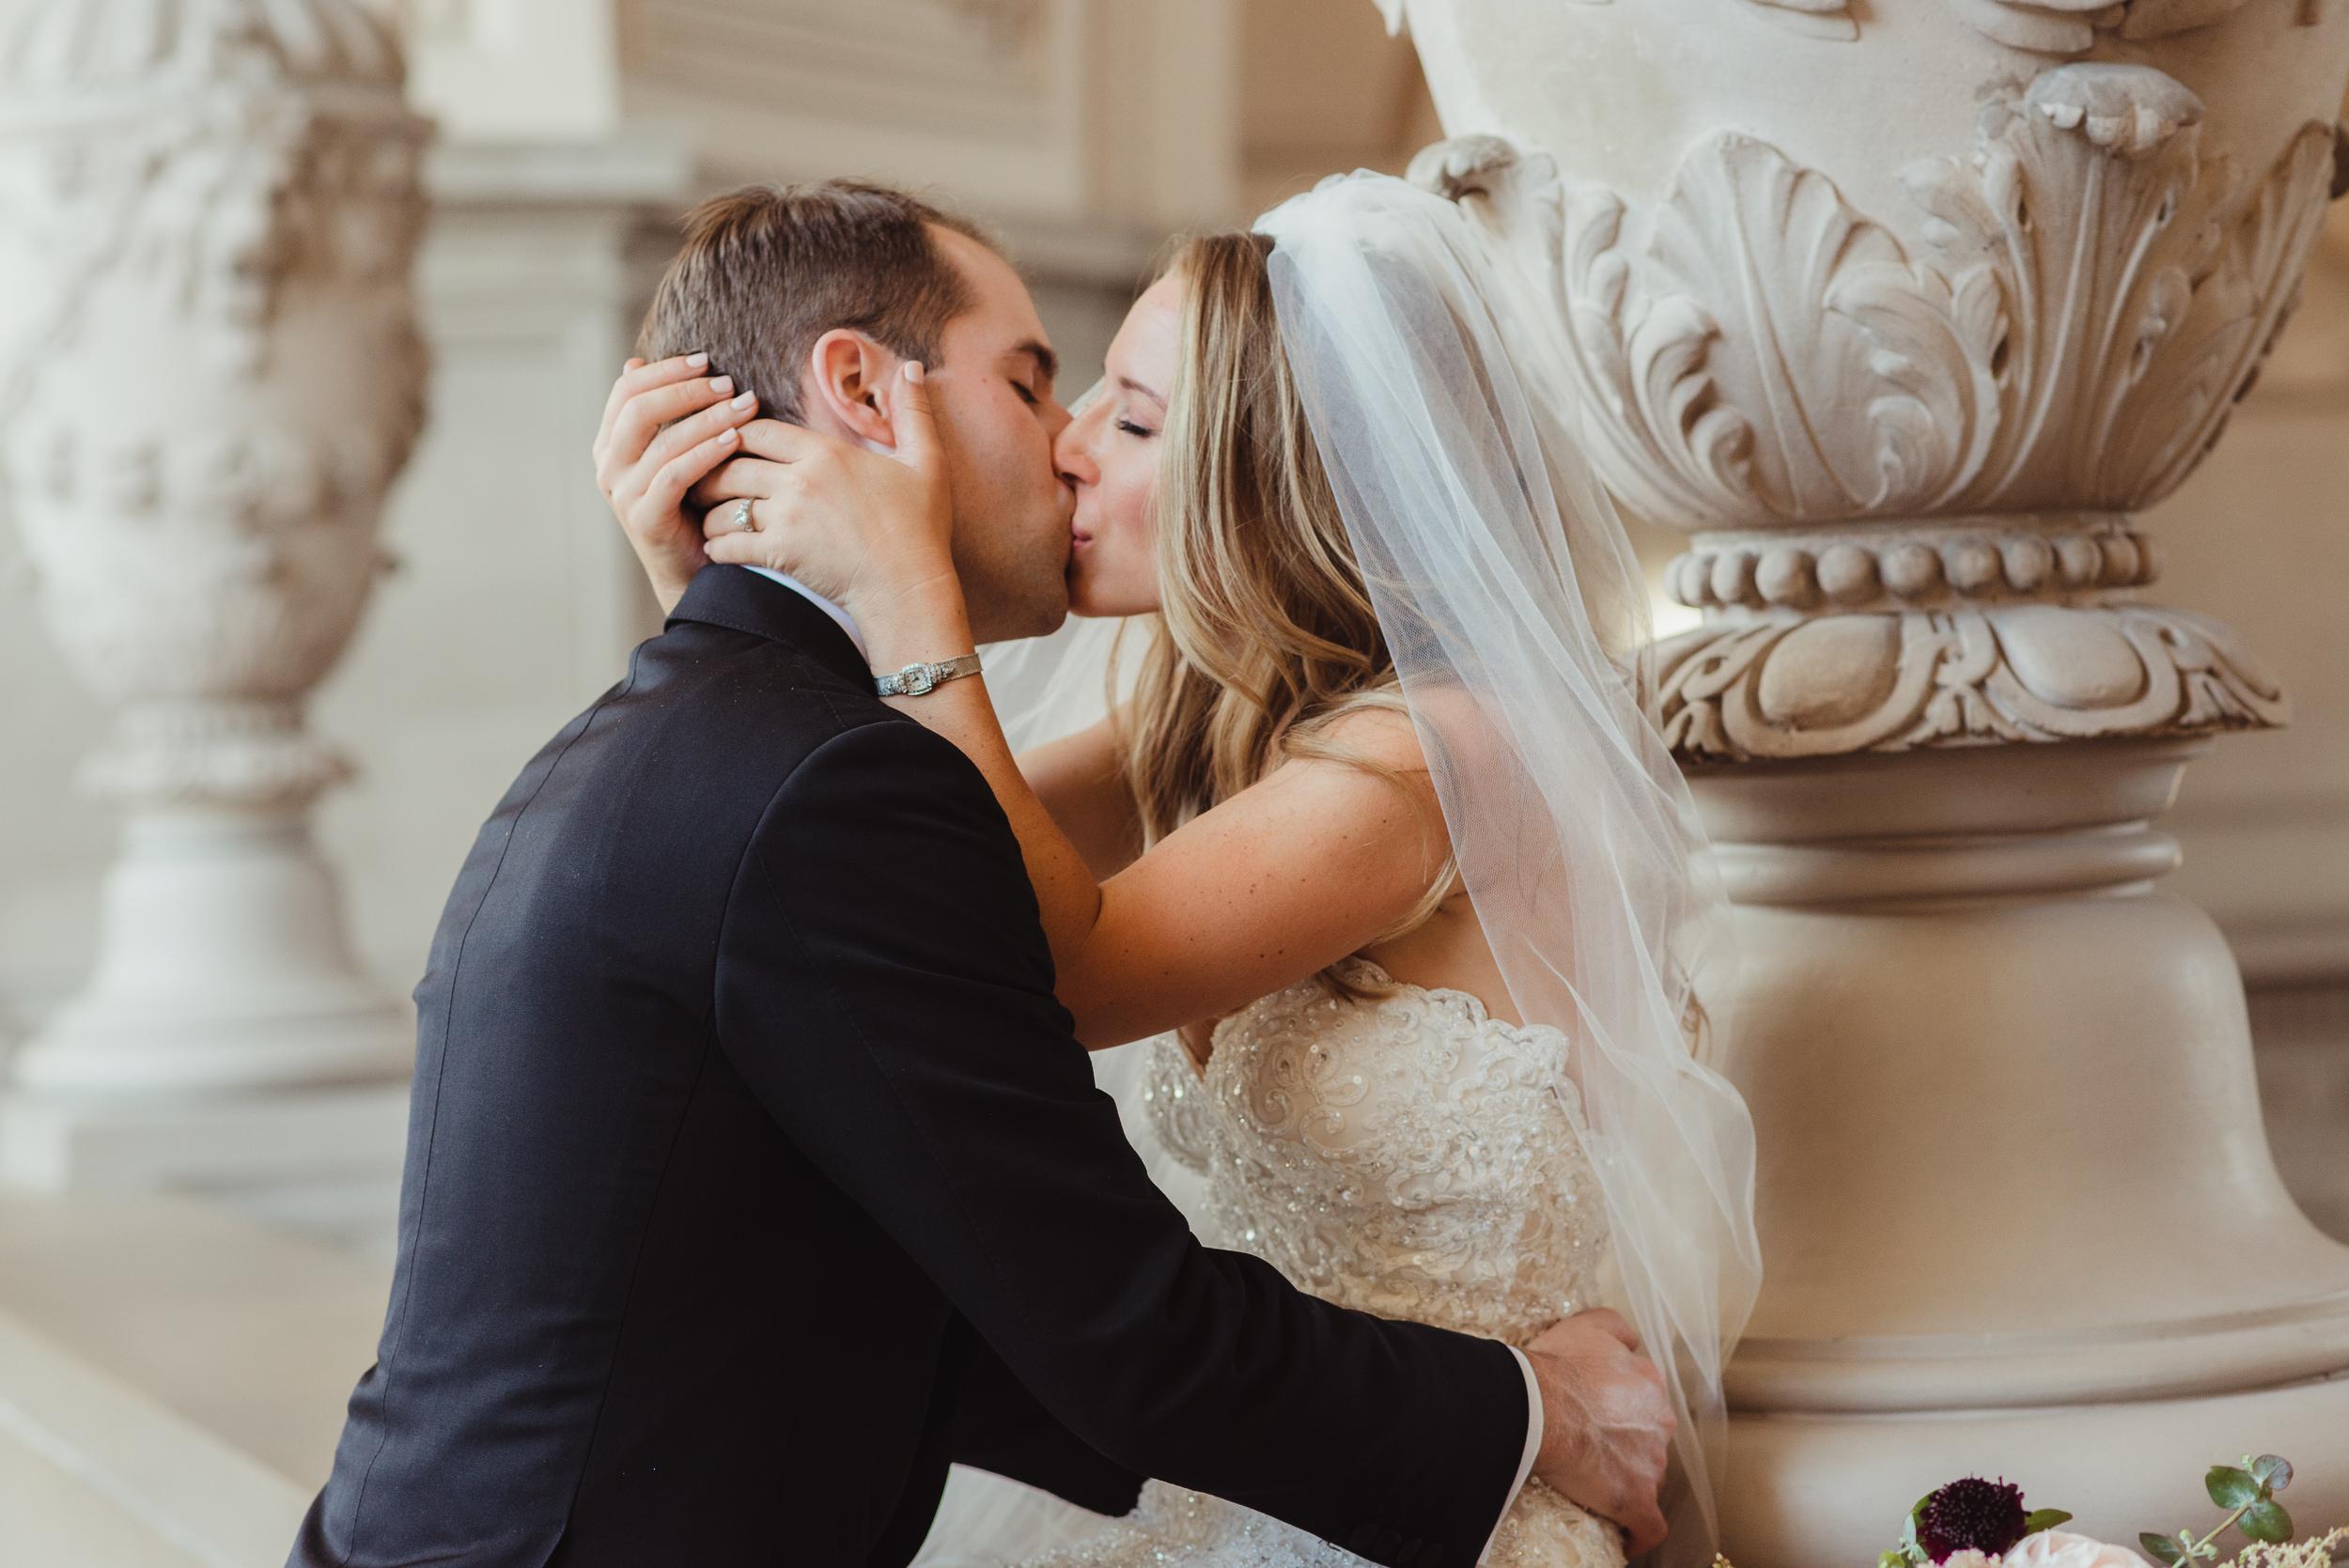 48-elegant-san-francisco-city-hall-wedding-vivianchen-0677.jpg